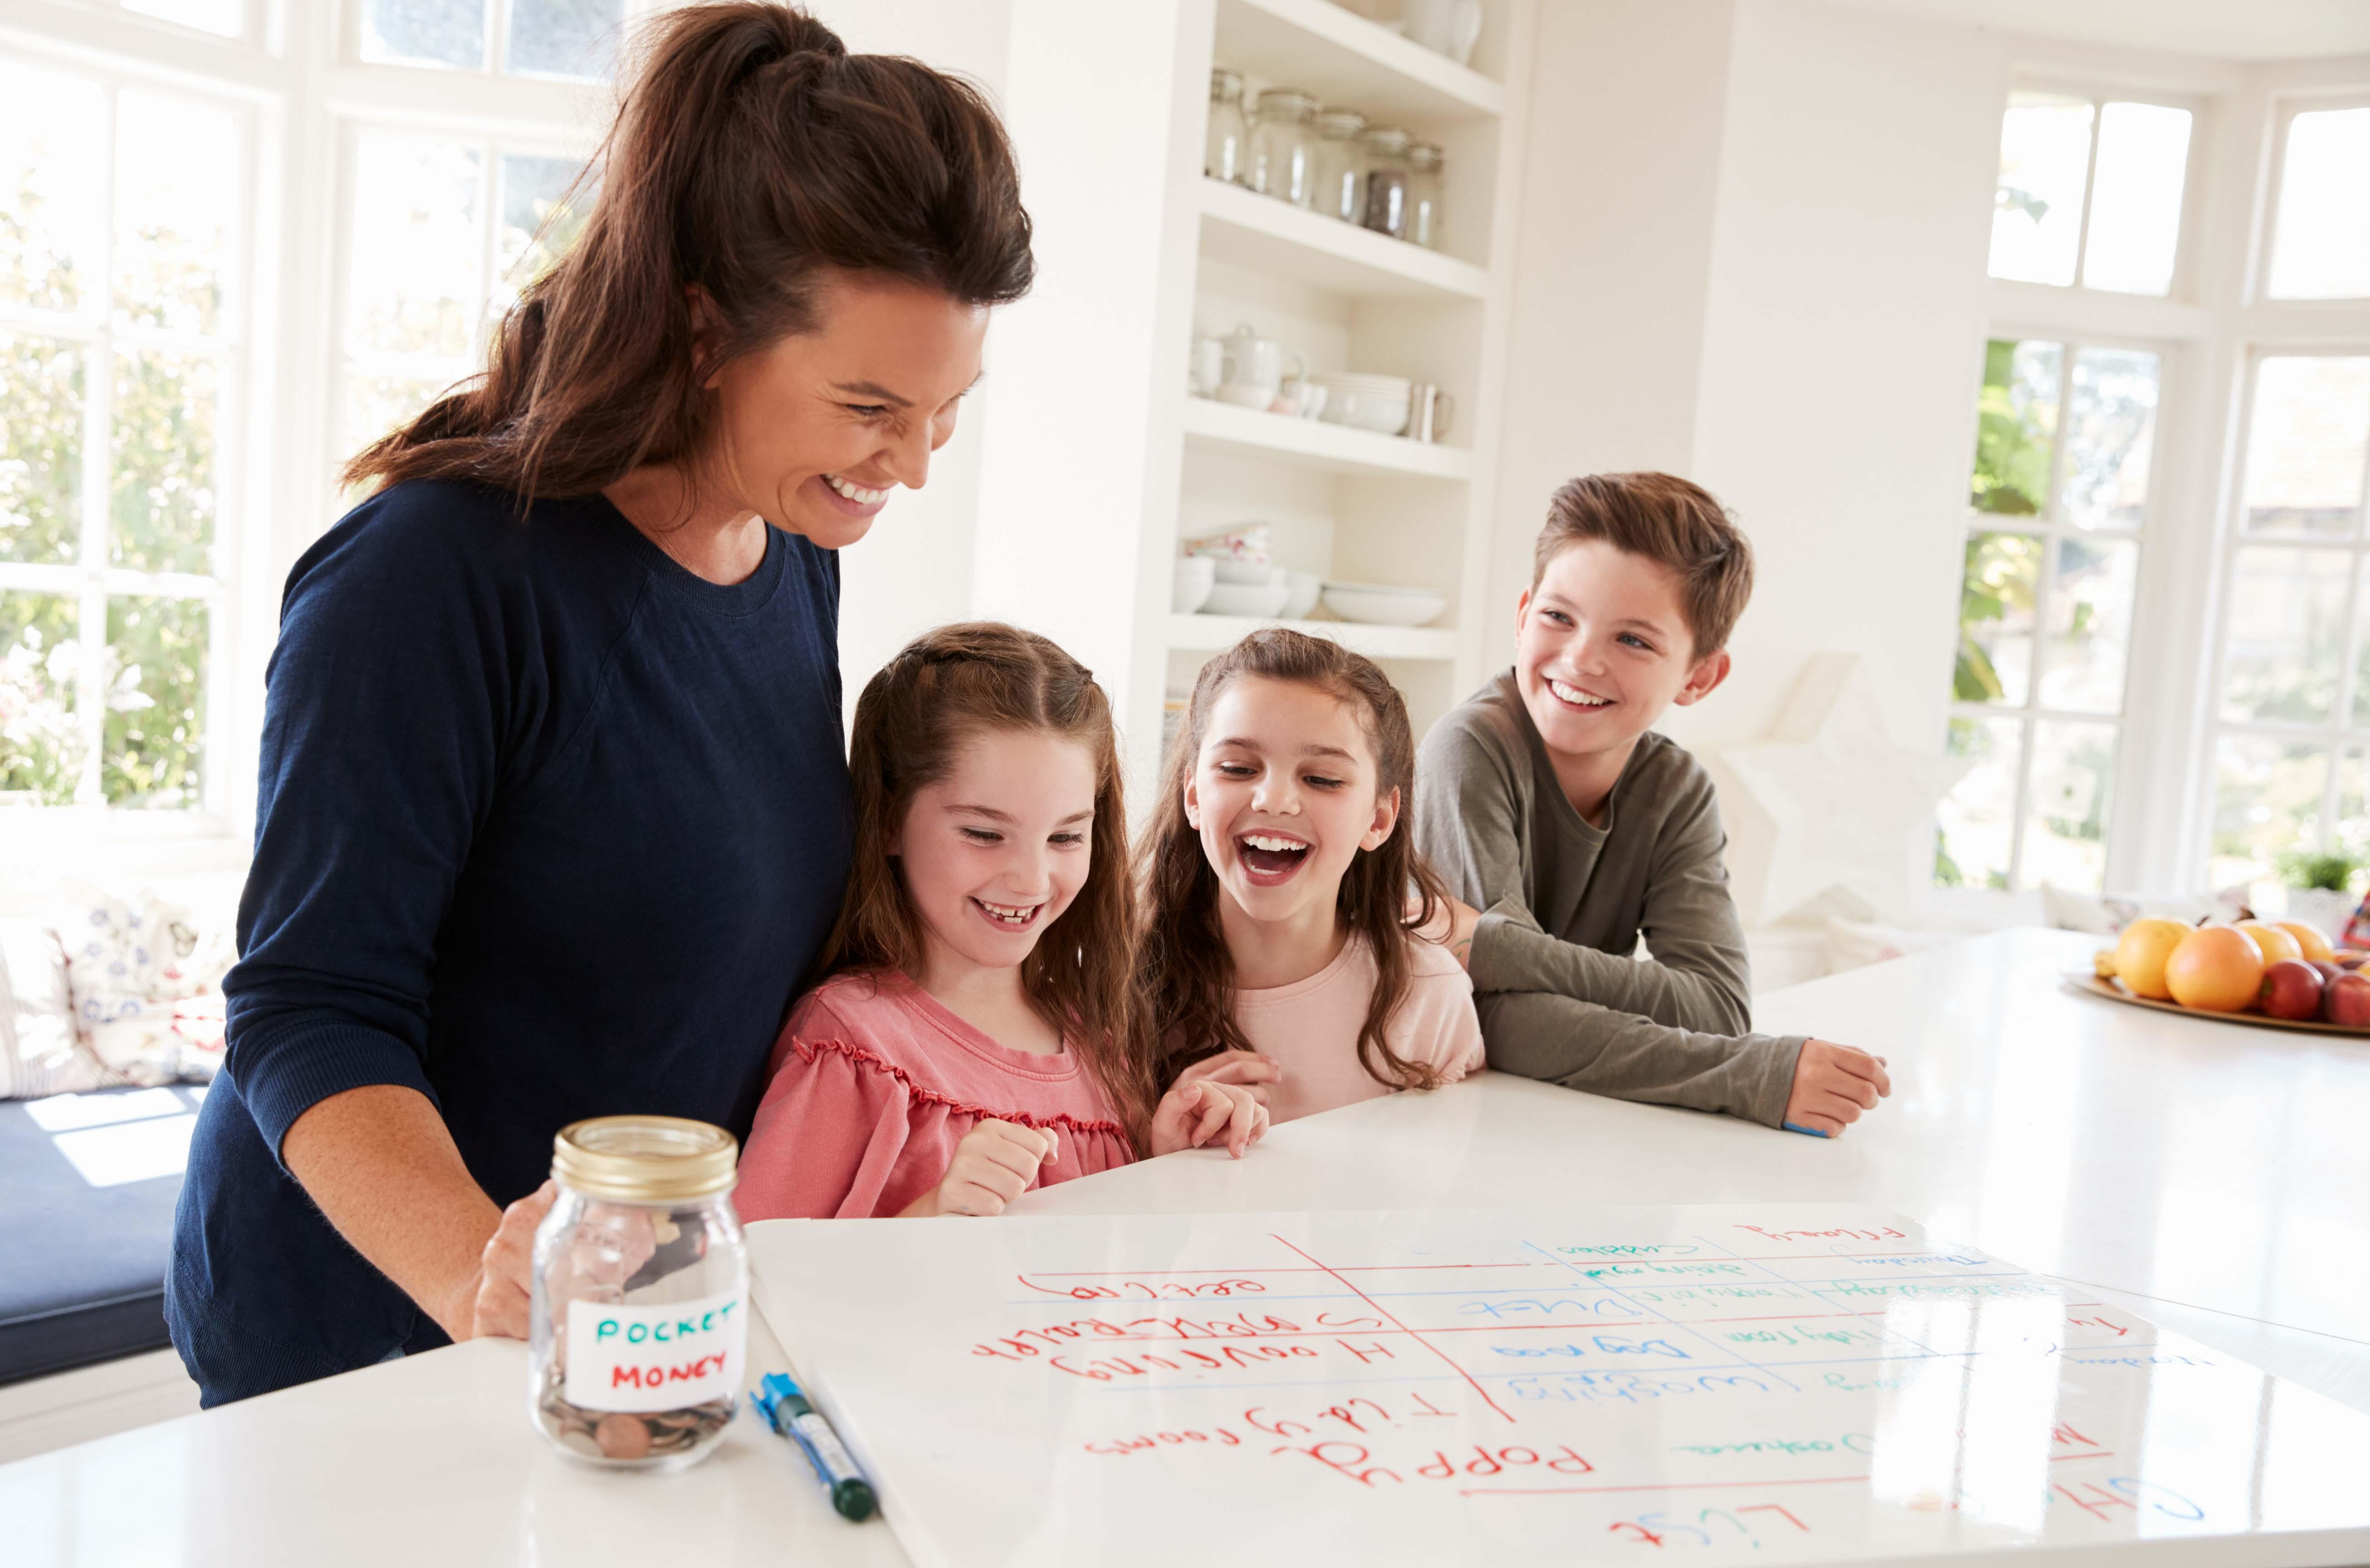 mother teaching kids finances